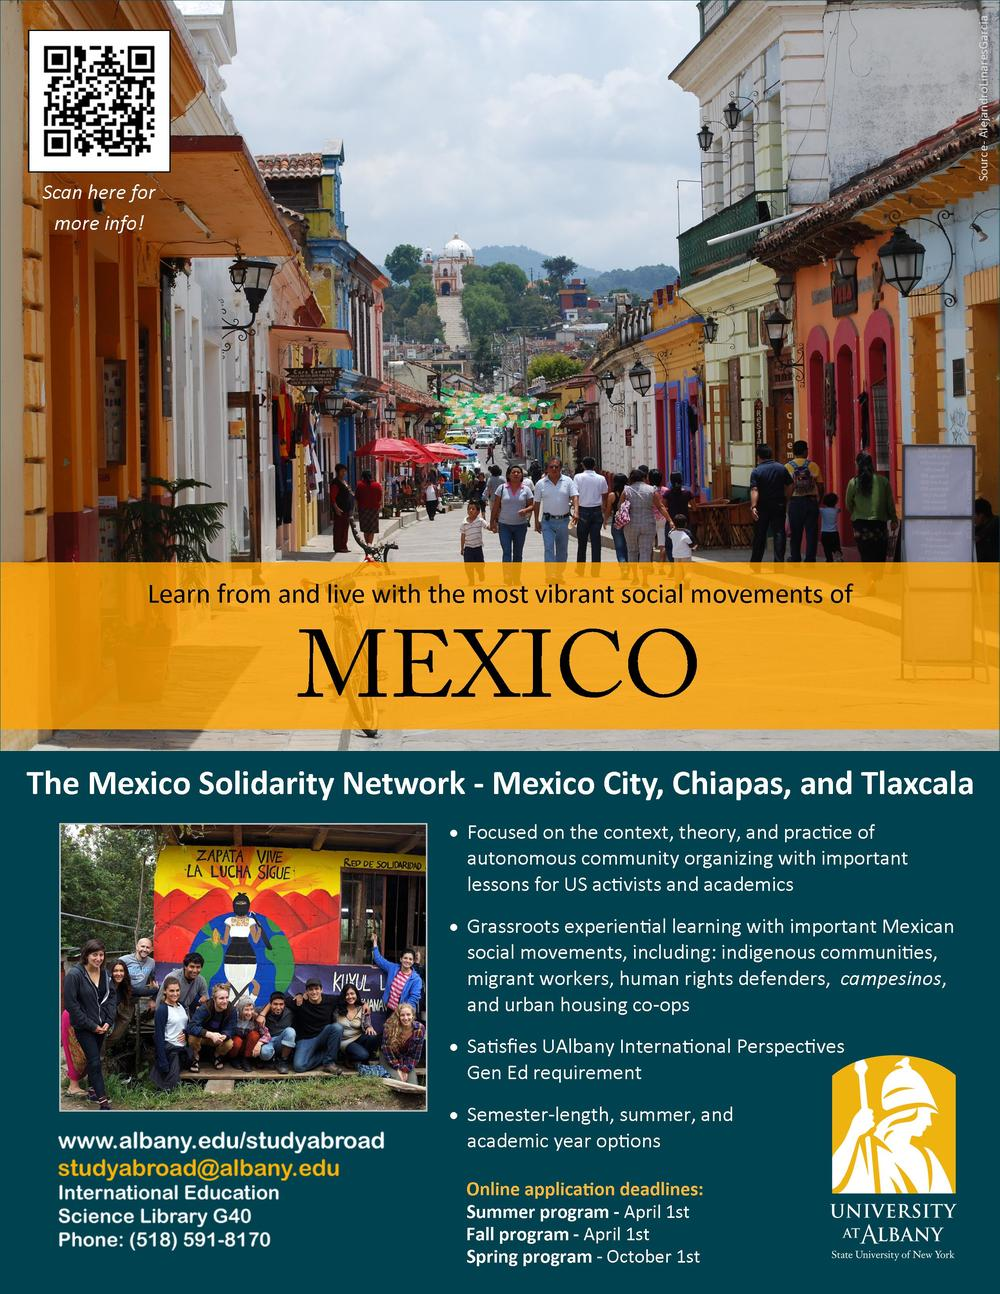 mexico 2013jpg